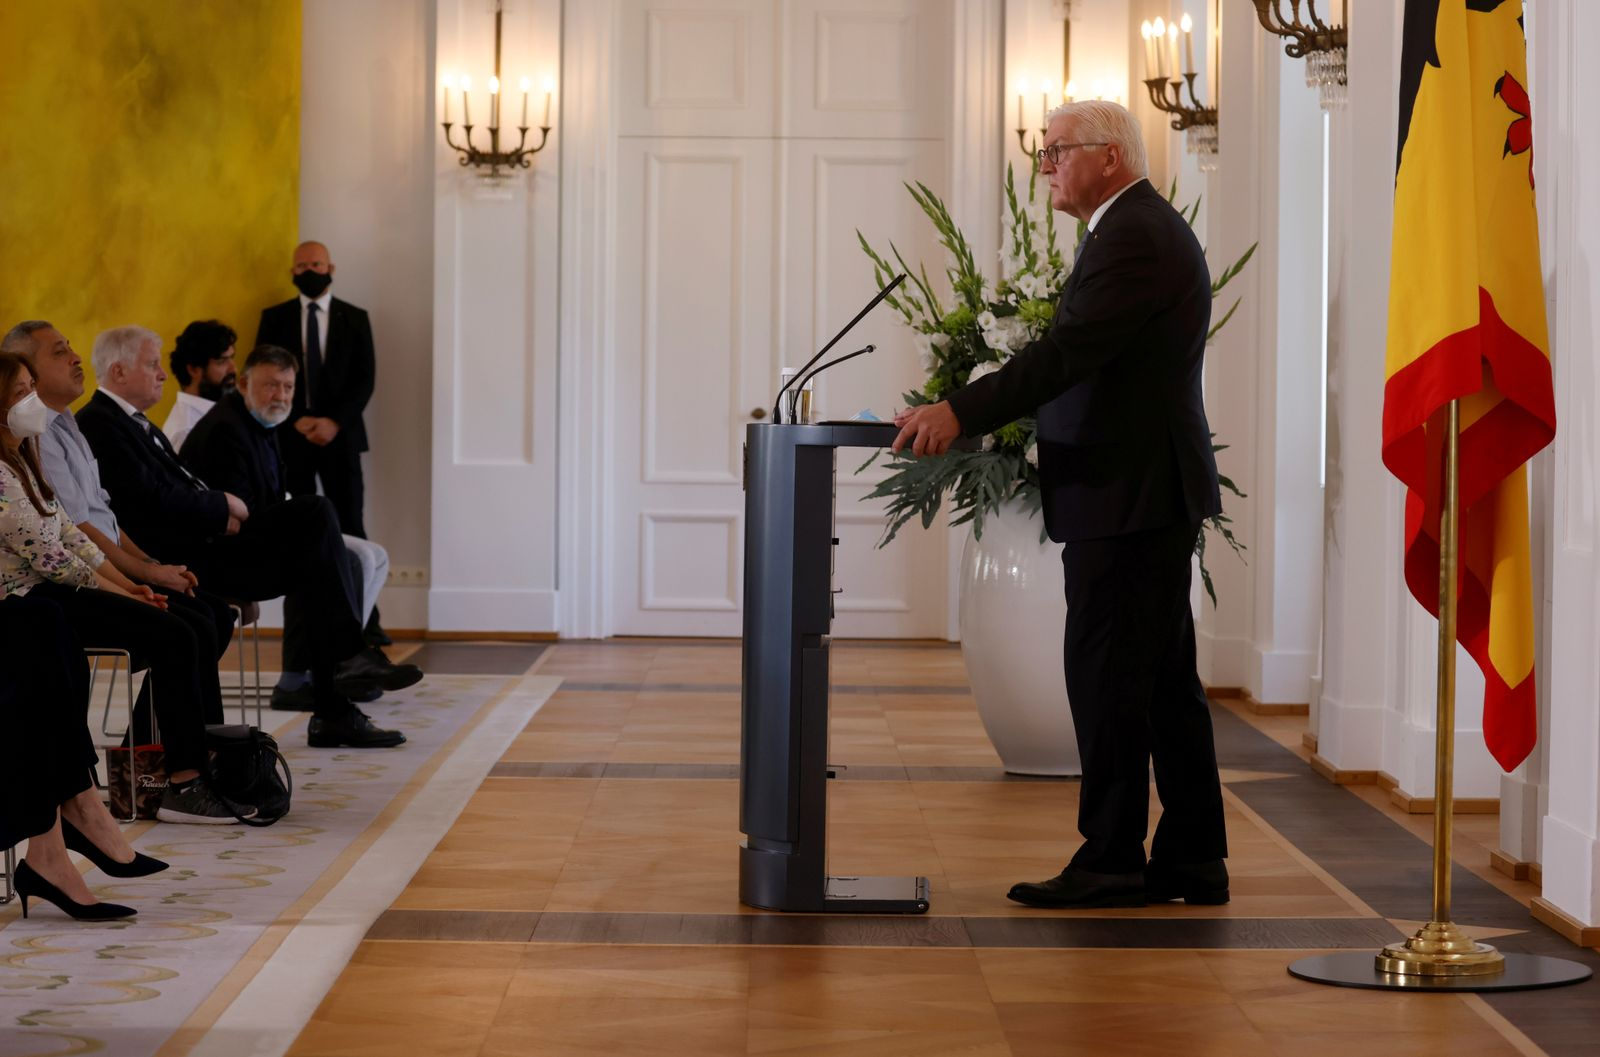 Steinmeier meets relatives of Hanau shooting victims